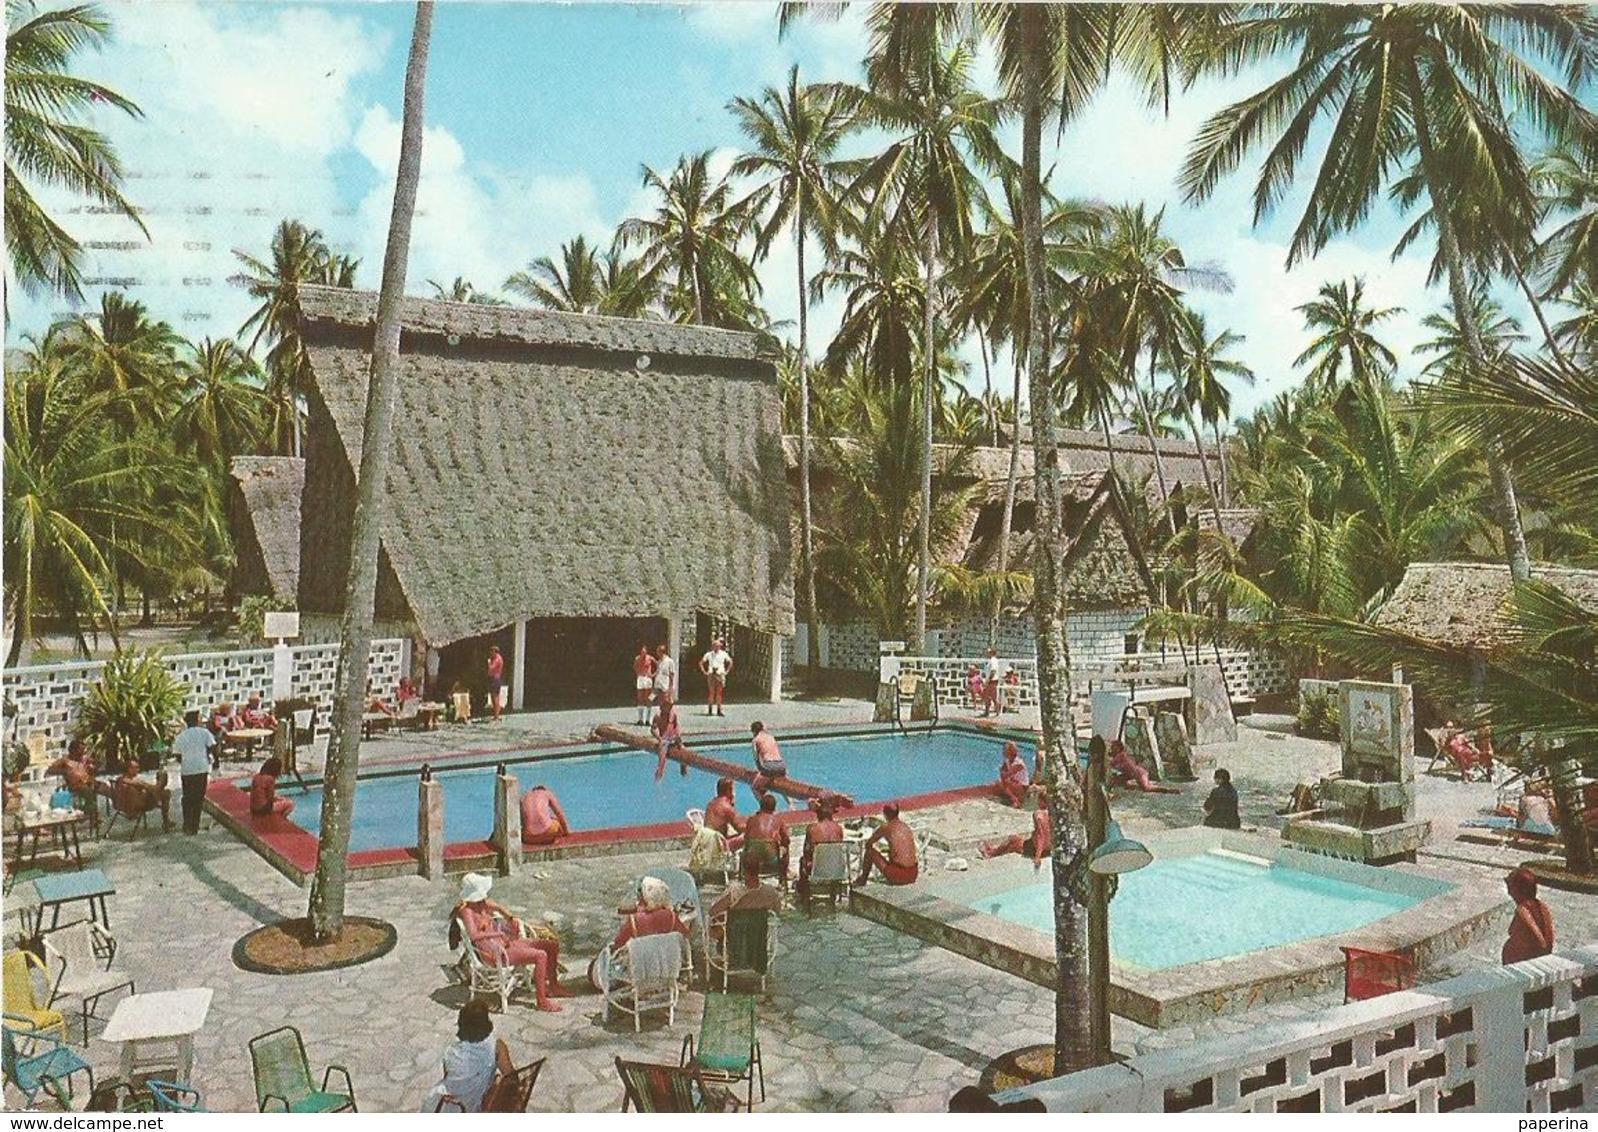 WHISPERING PALMS HOTEL KENYA (127) - Kenia